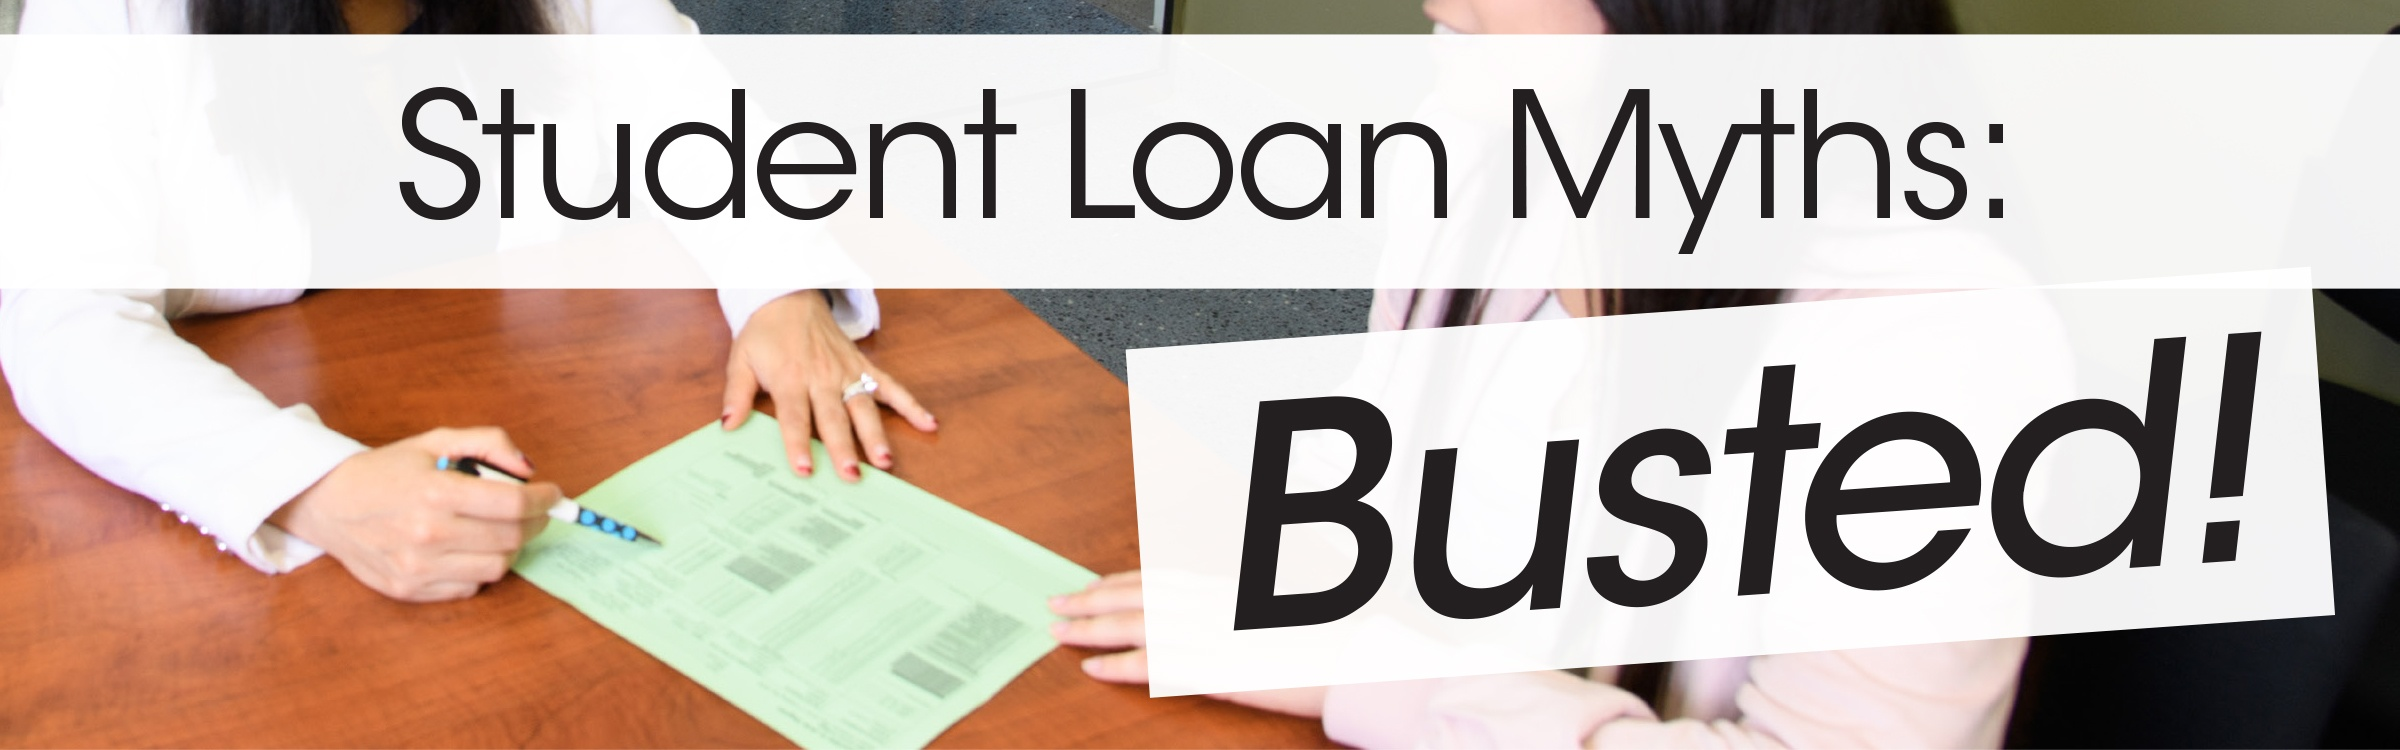 student loan myths busted banner jjc joliet junior college